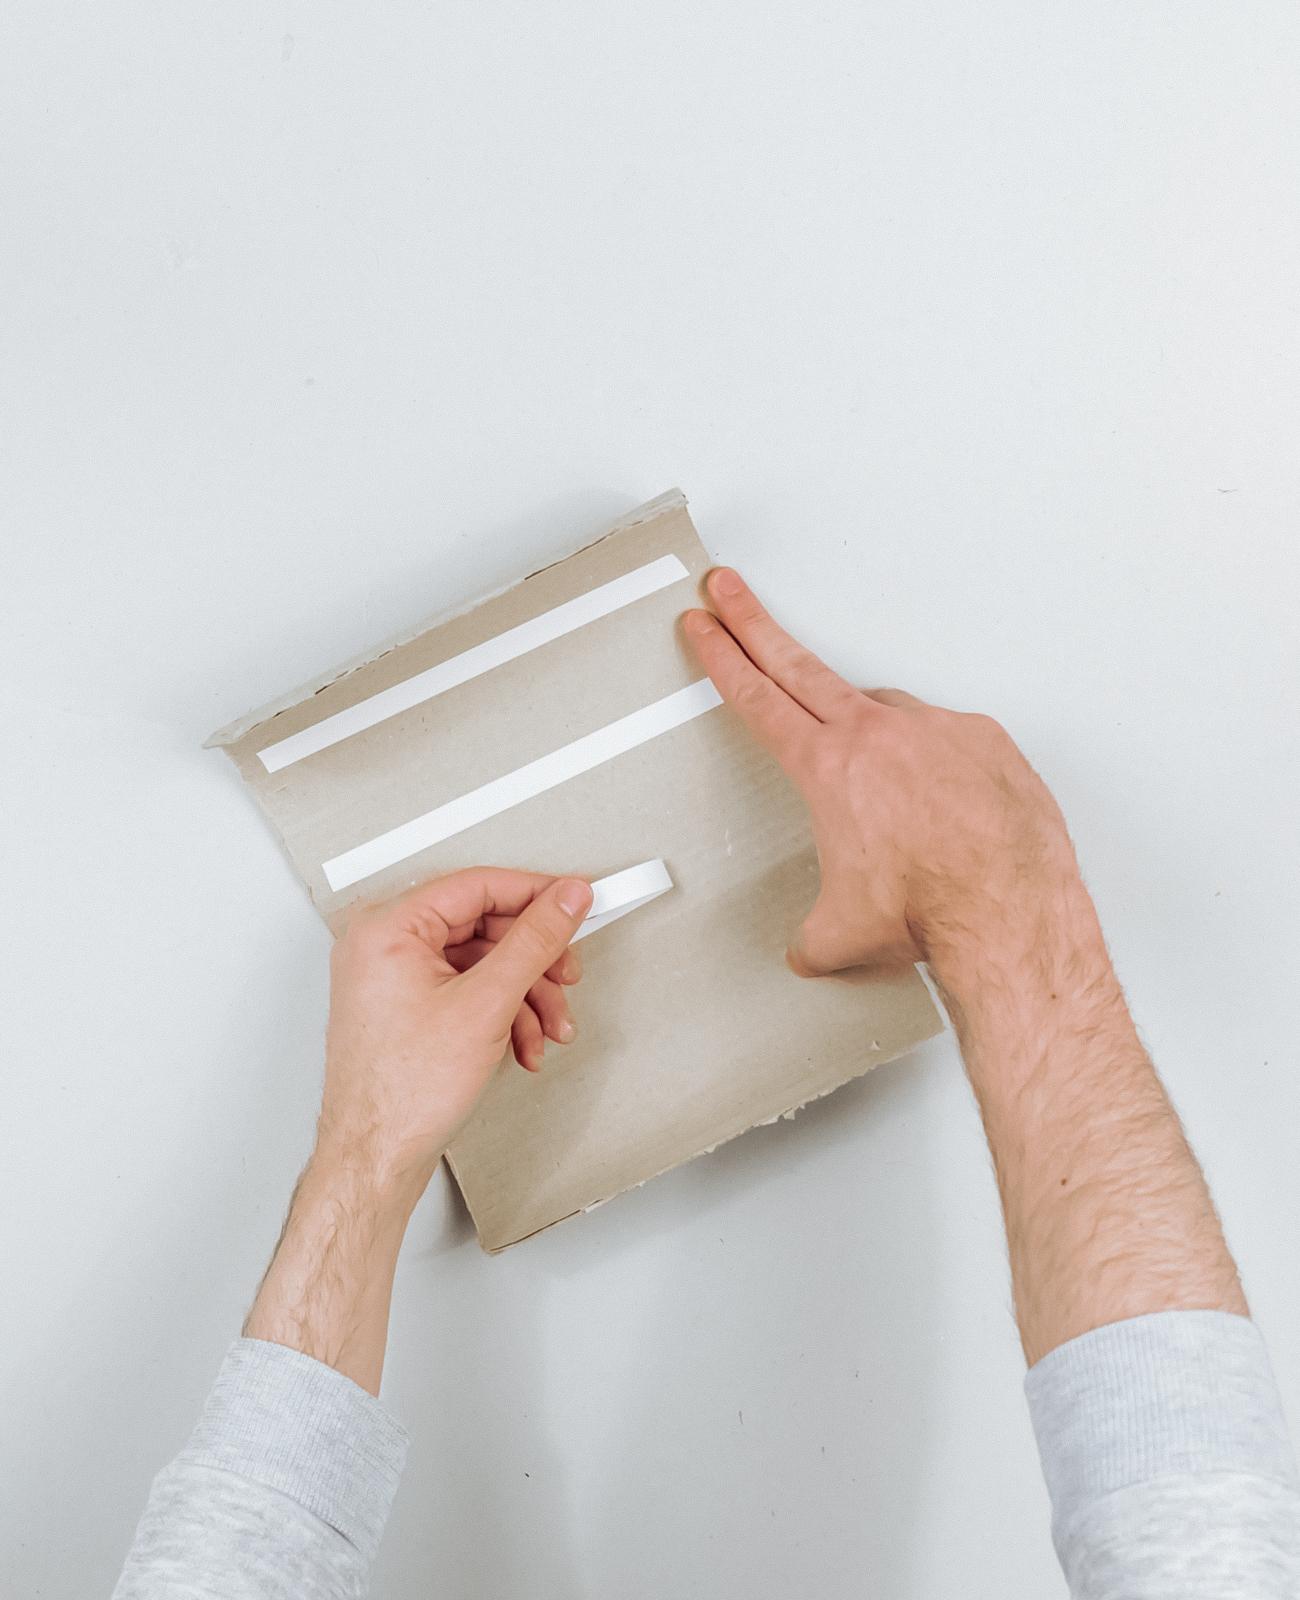 vase carton strie gaufre terracotta tuto diy etape 5